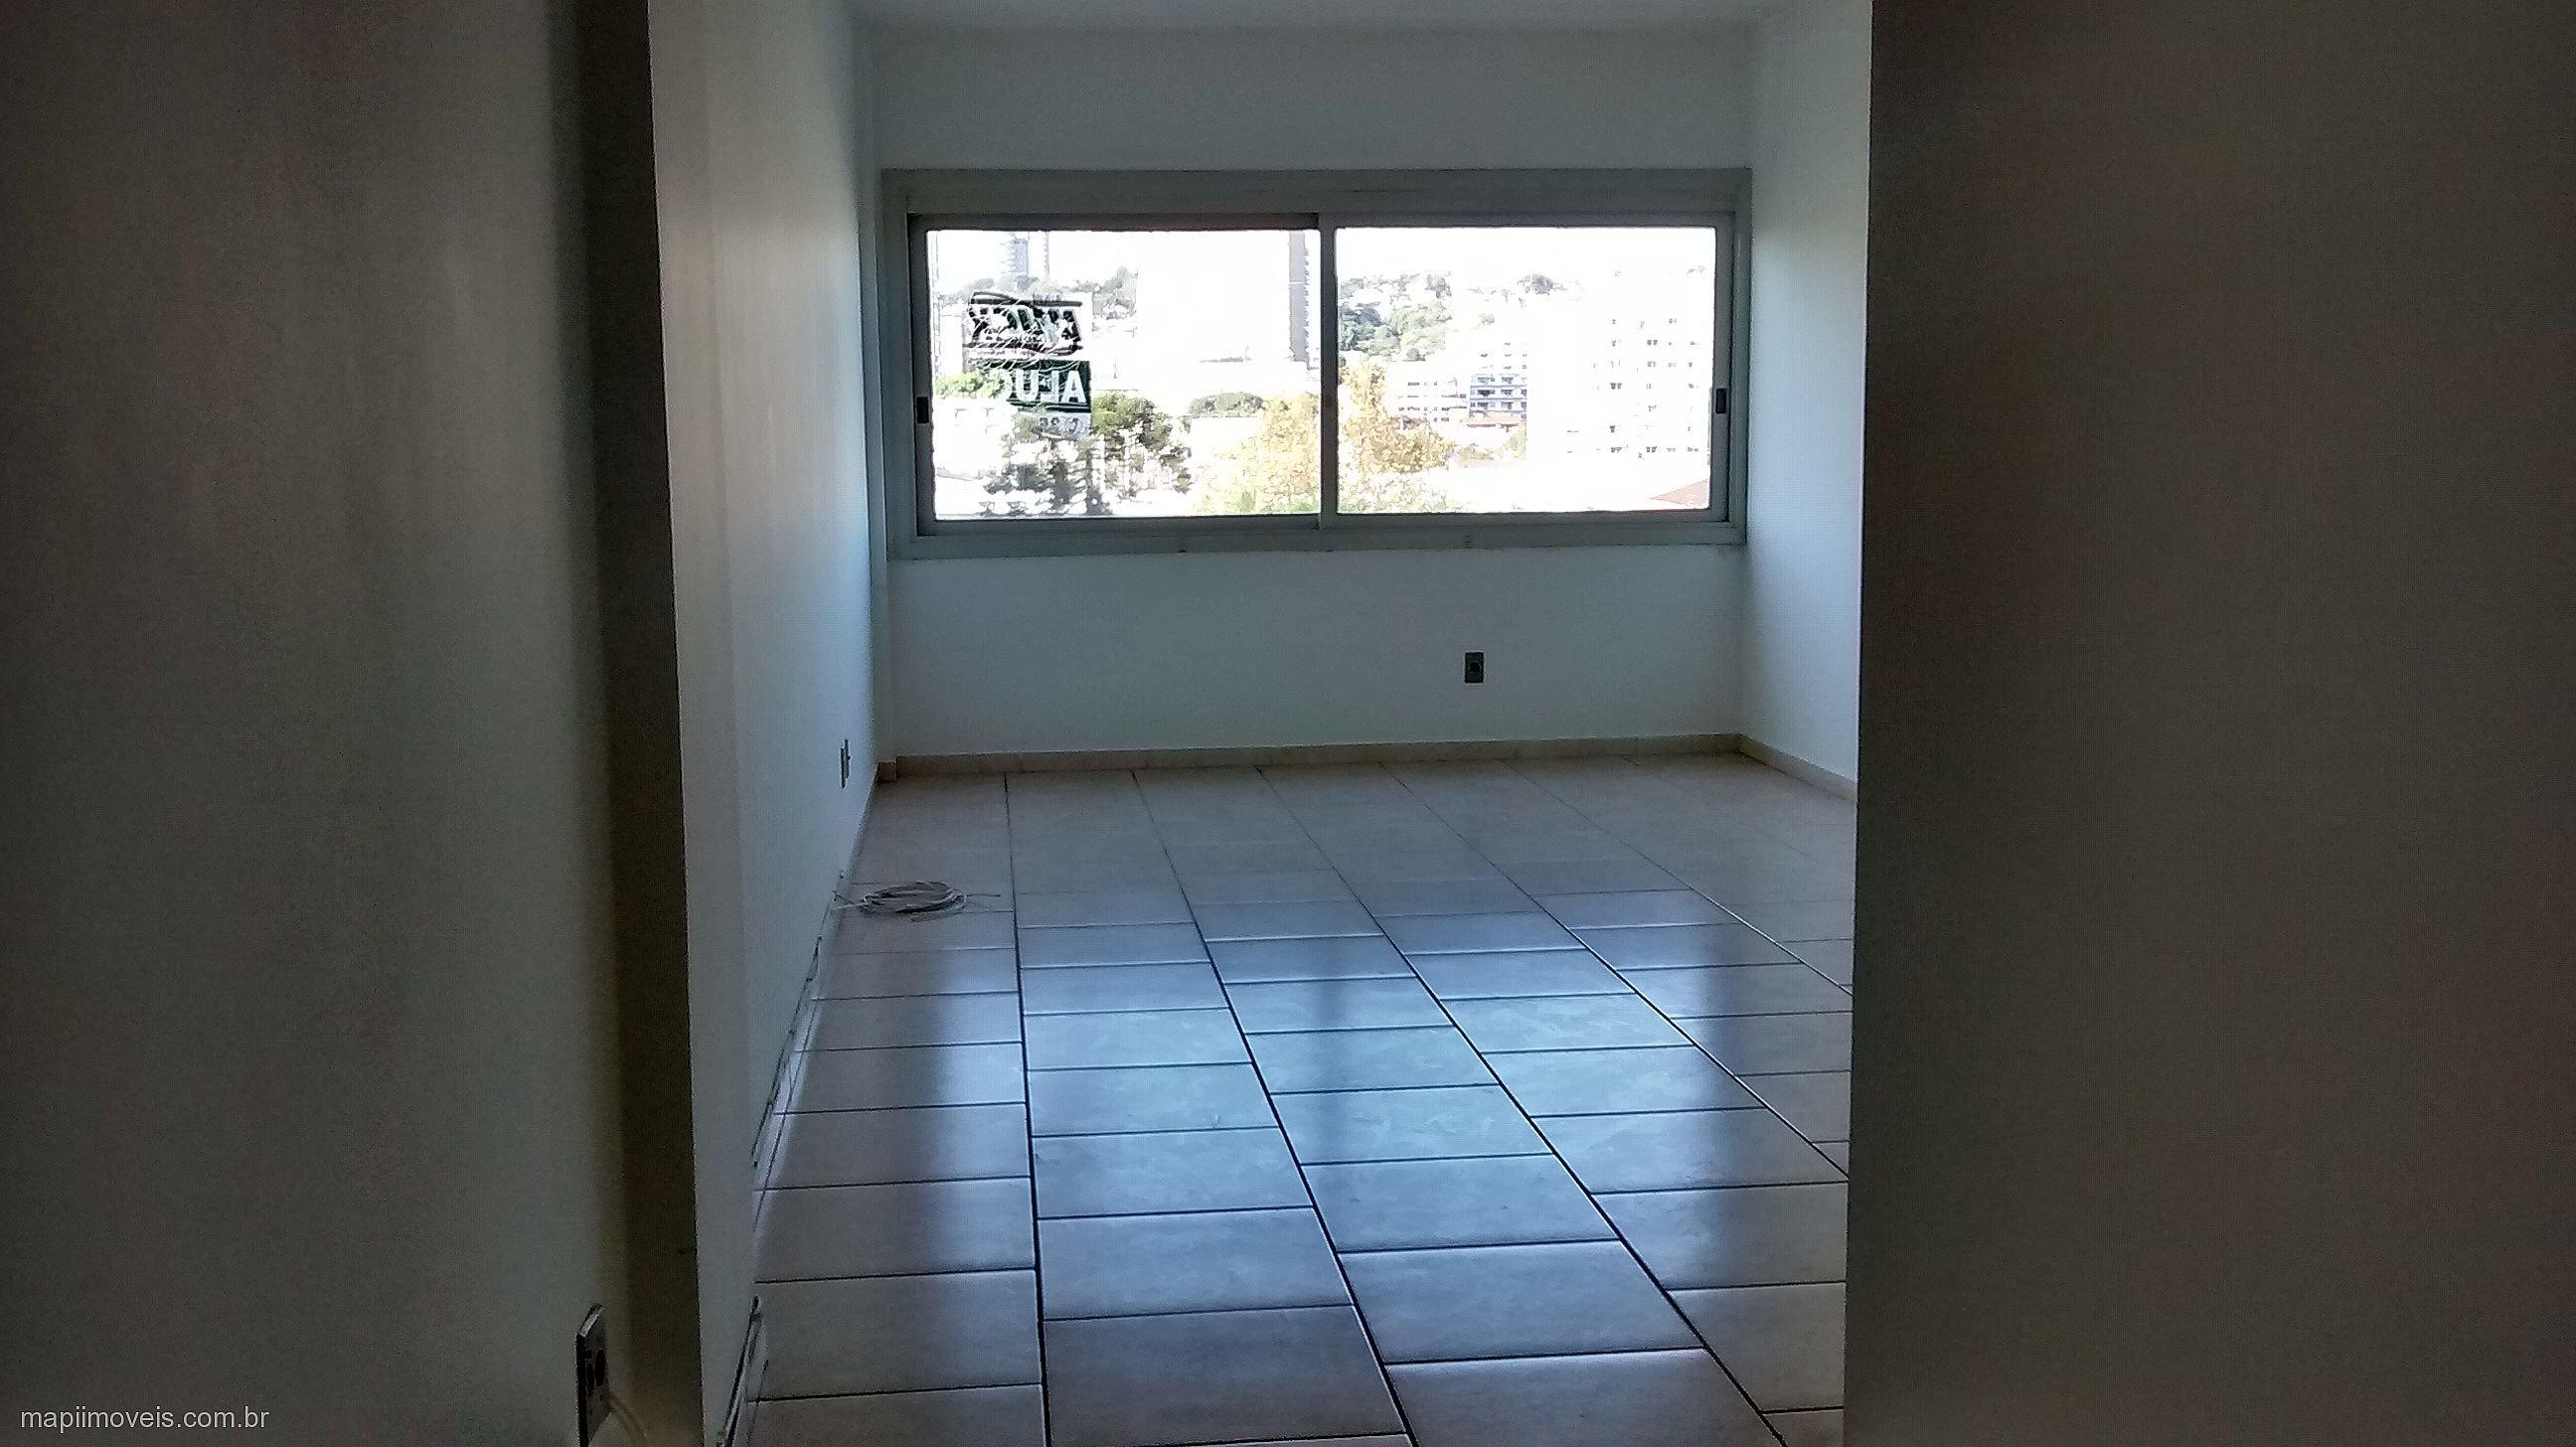 Mapi Imóveis - Apto 2 Dorm, Rio Branco (284762)